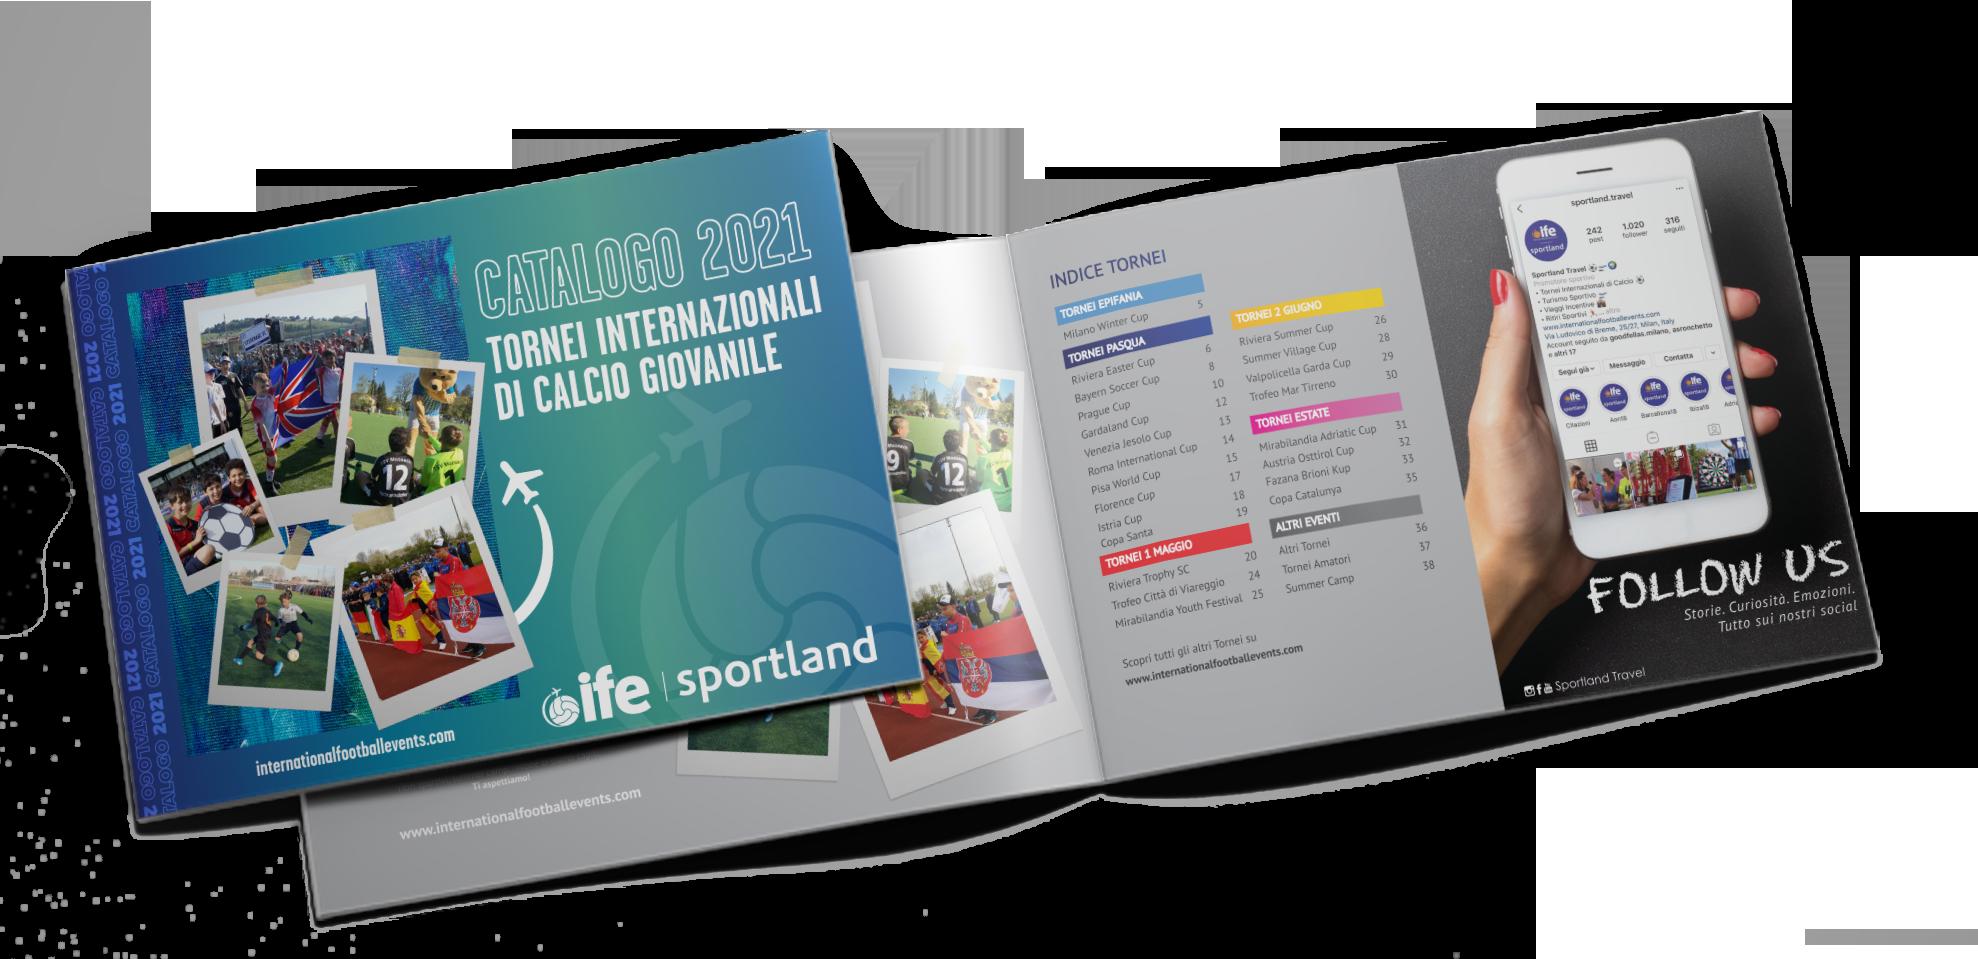 catalogo tornei calcio giovanile ife sportland 2021